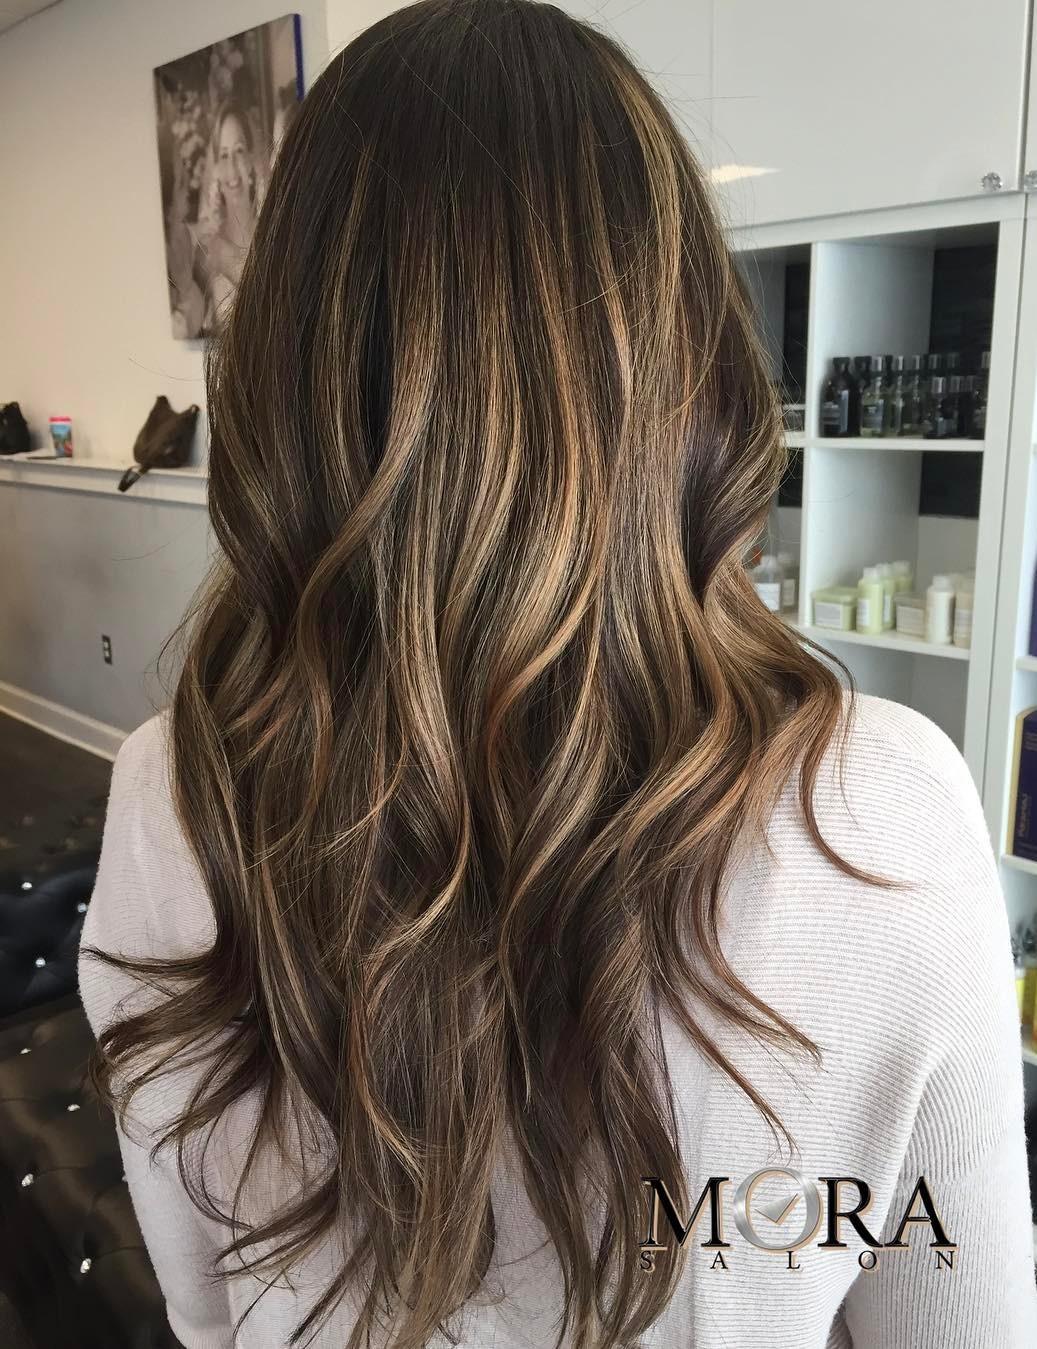 Brown Long Hair with Layers and Balayage